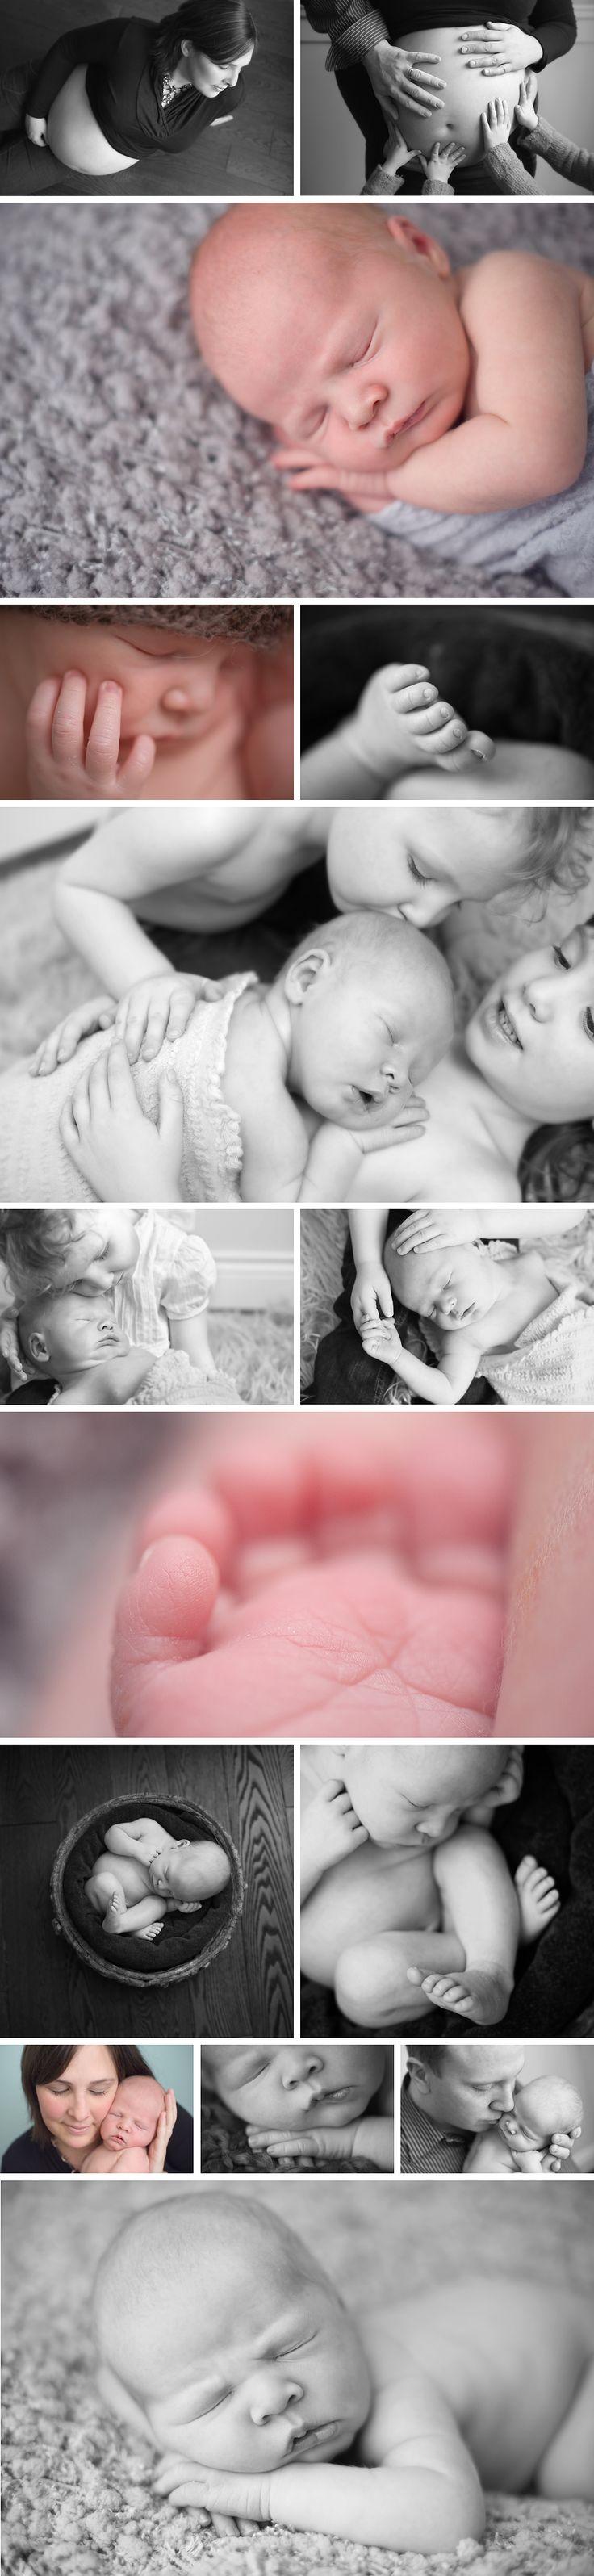 I really like a few of the detail shots.: Kids Idea, Newborn Photography, Photo Andra, Nature Feeling, Photography Prints Posts, Baby Photoshoot, Photo Idea, Photography Children, Crafts Photography